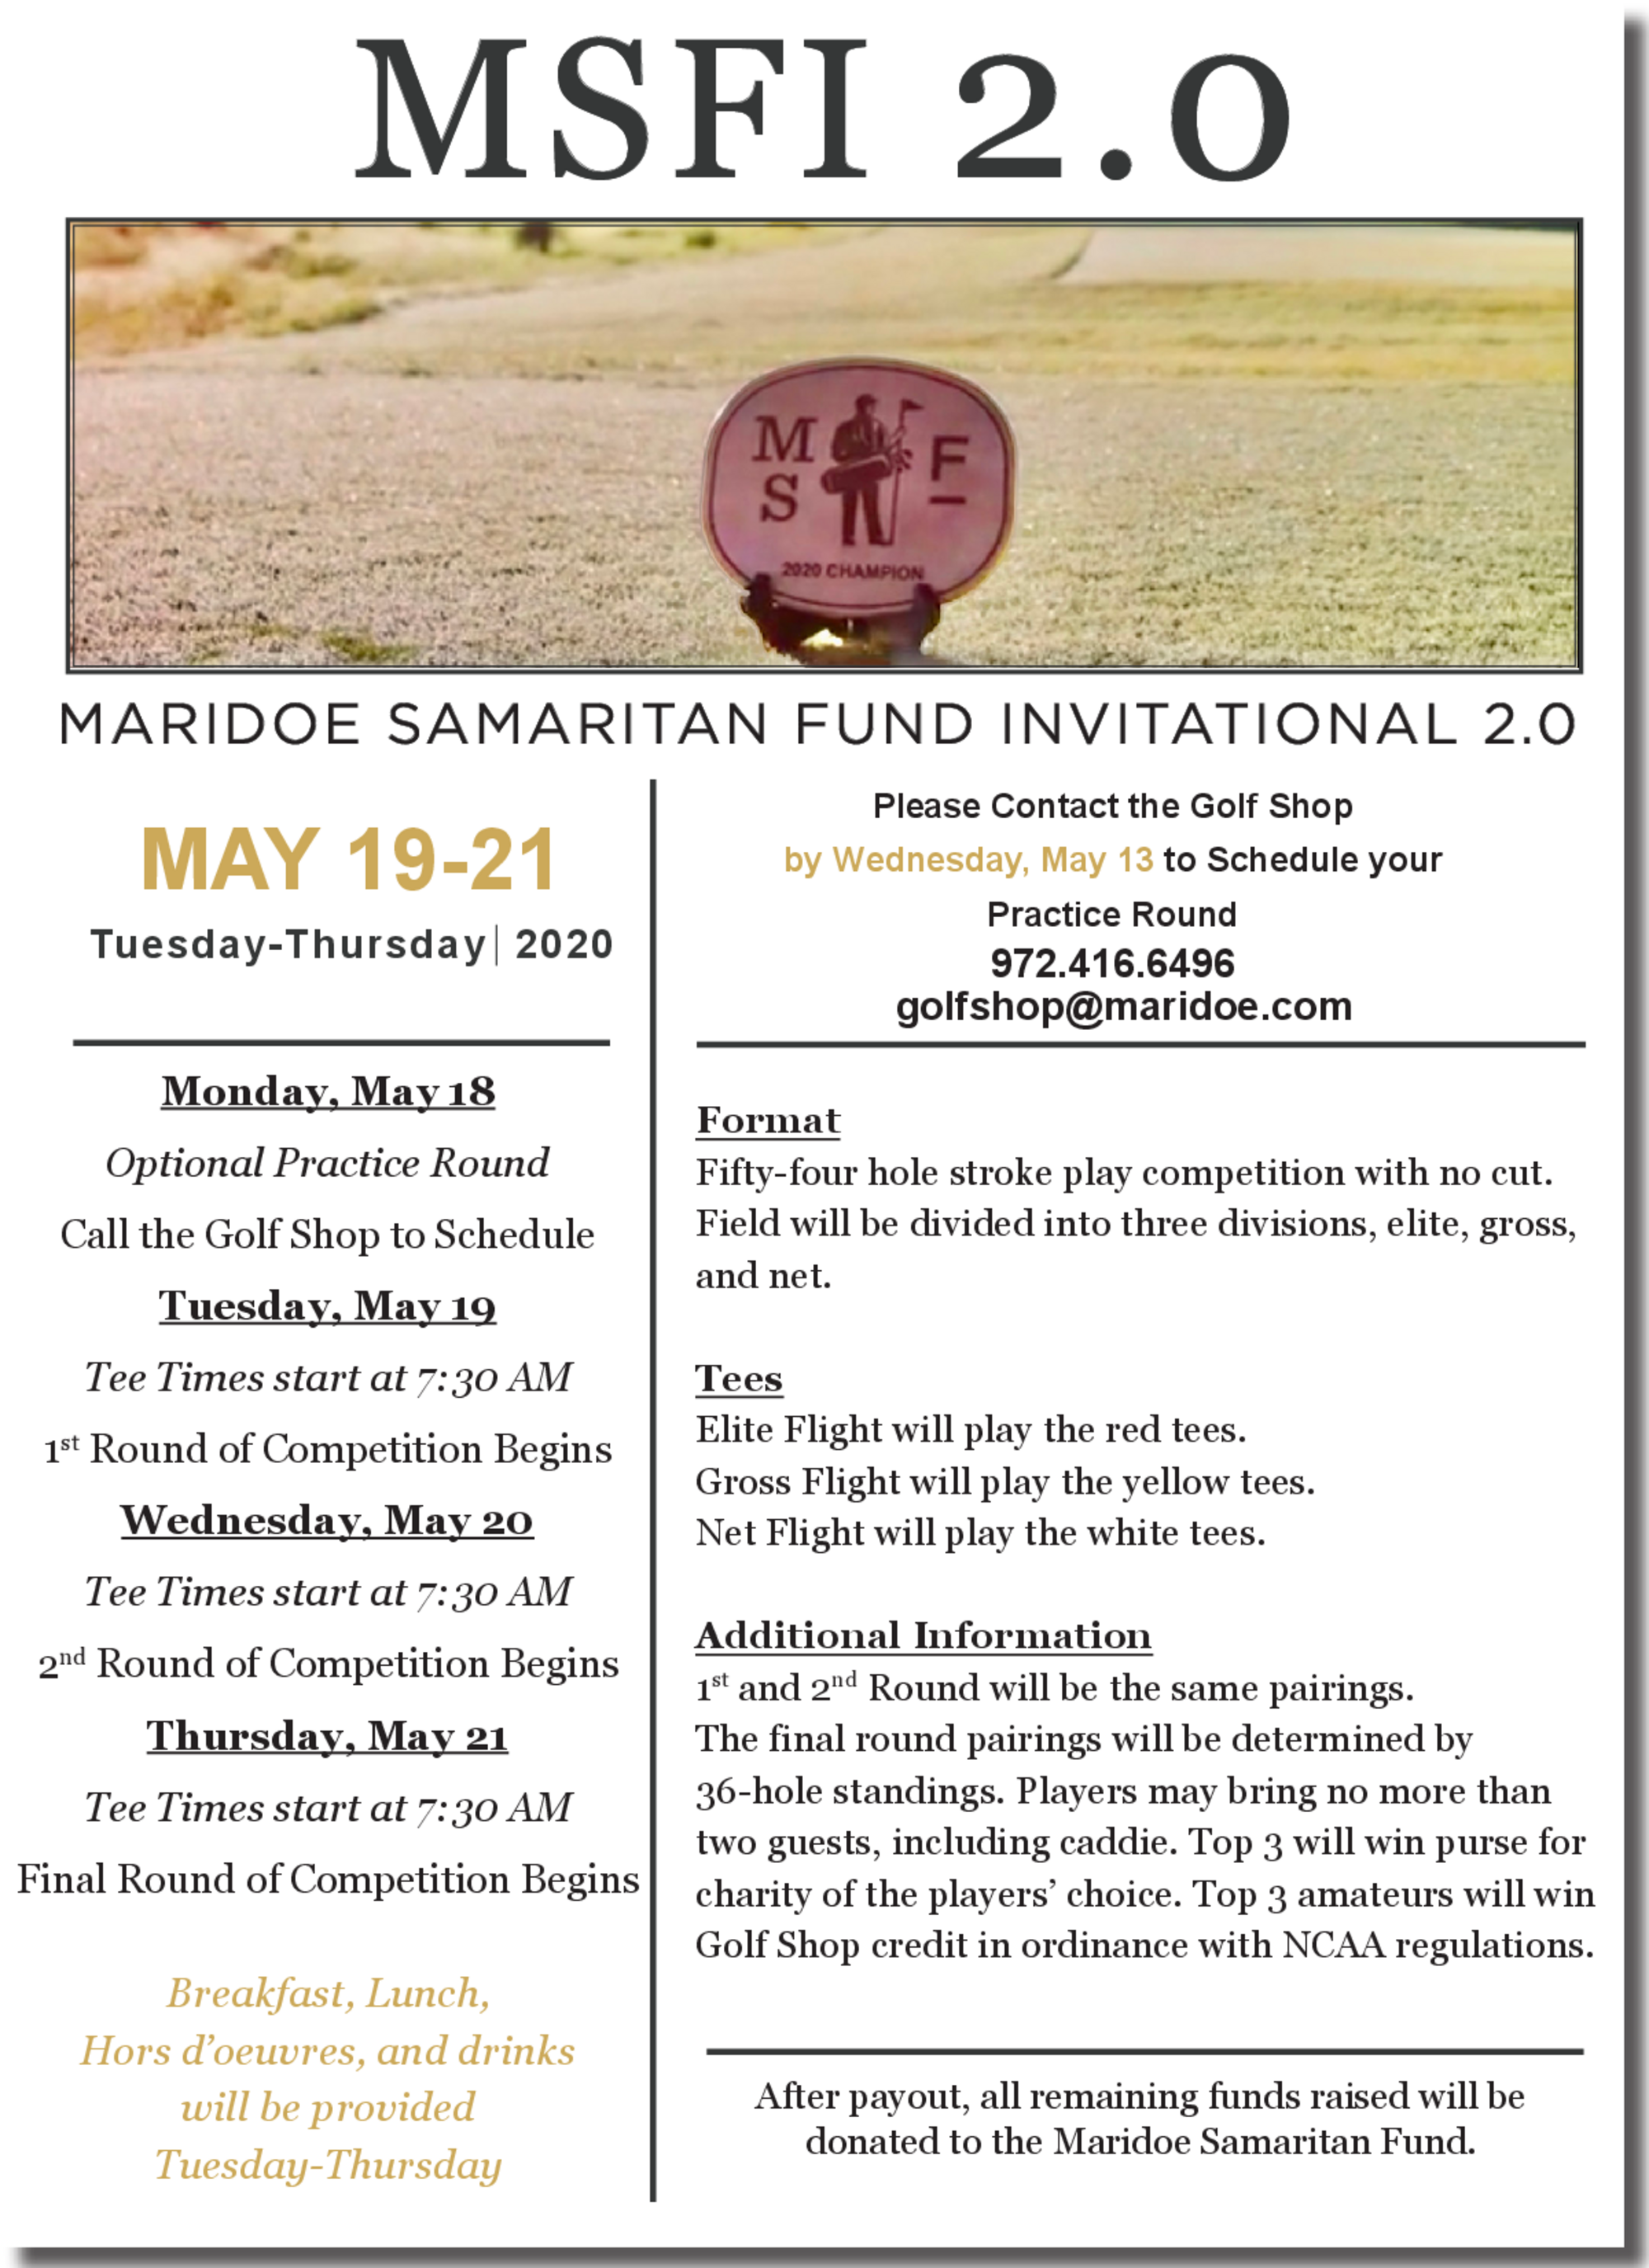 Msf invitational 2.0 flyer 1